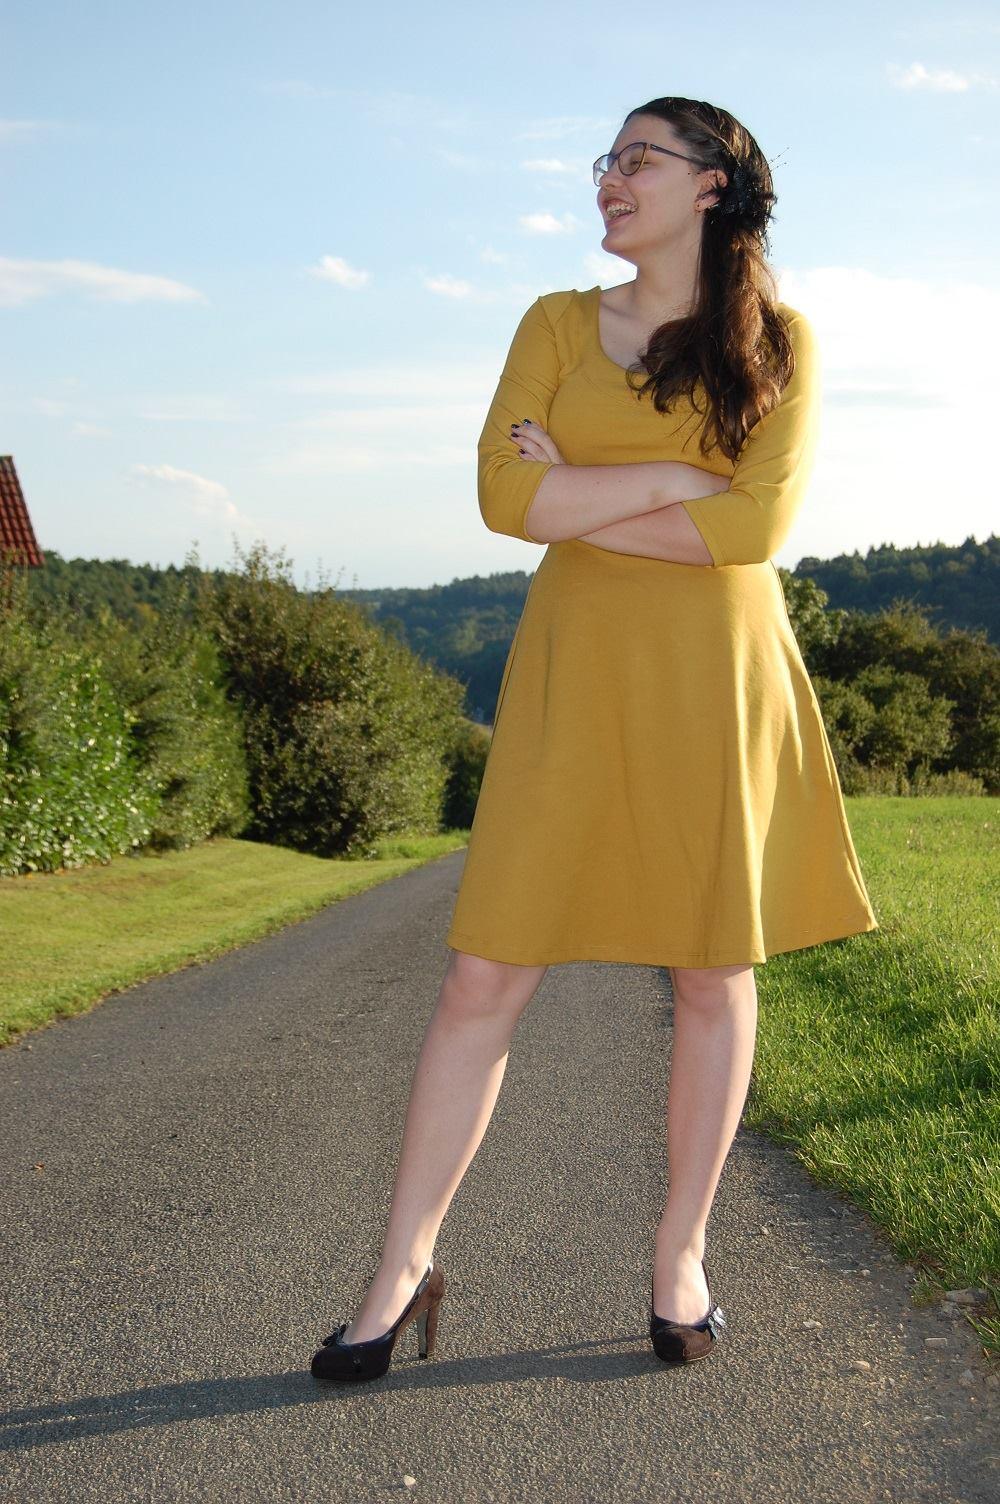 Nuria-Jerseykleid-farbenmix-bienvenido-colorido_Ebook-Kleid_Schnittmuster-gelbes-Damenkleid